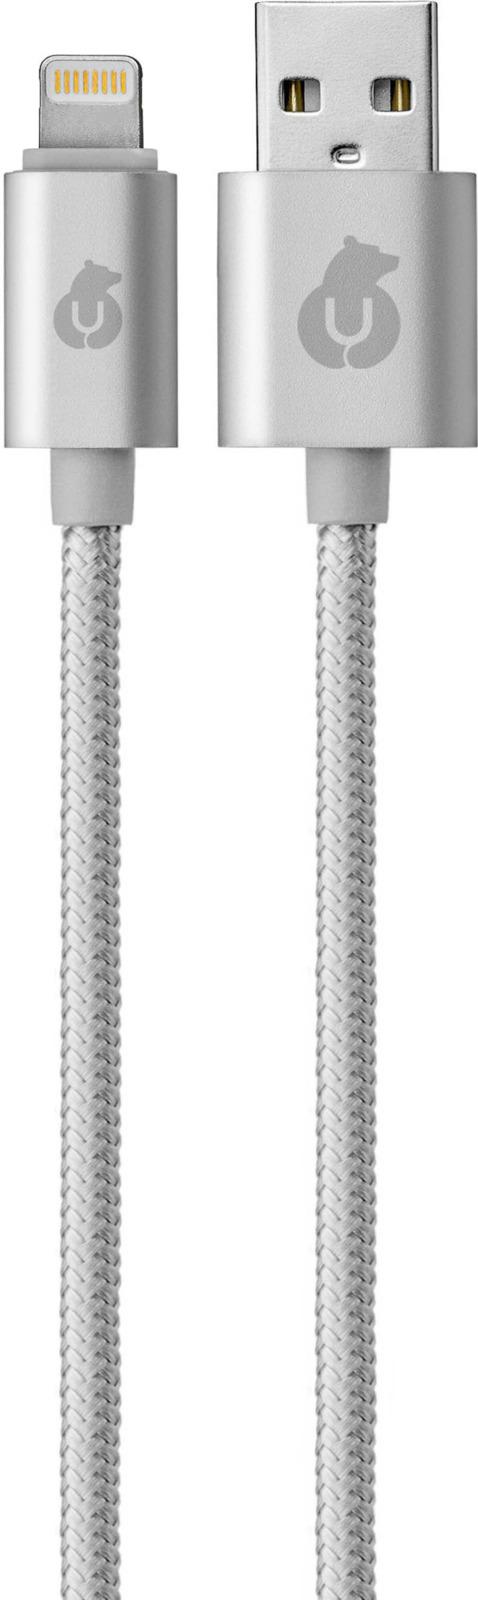 uBear Lightning-USB, Gray кабель Apple Lightning цена